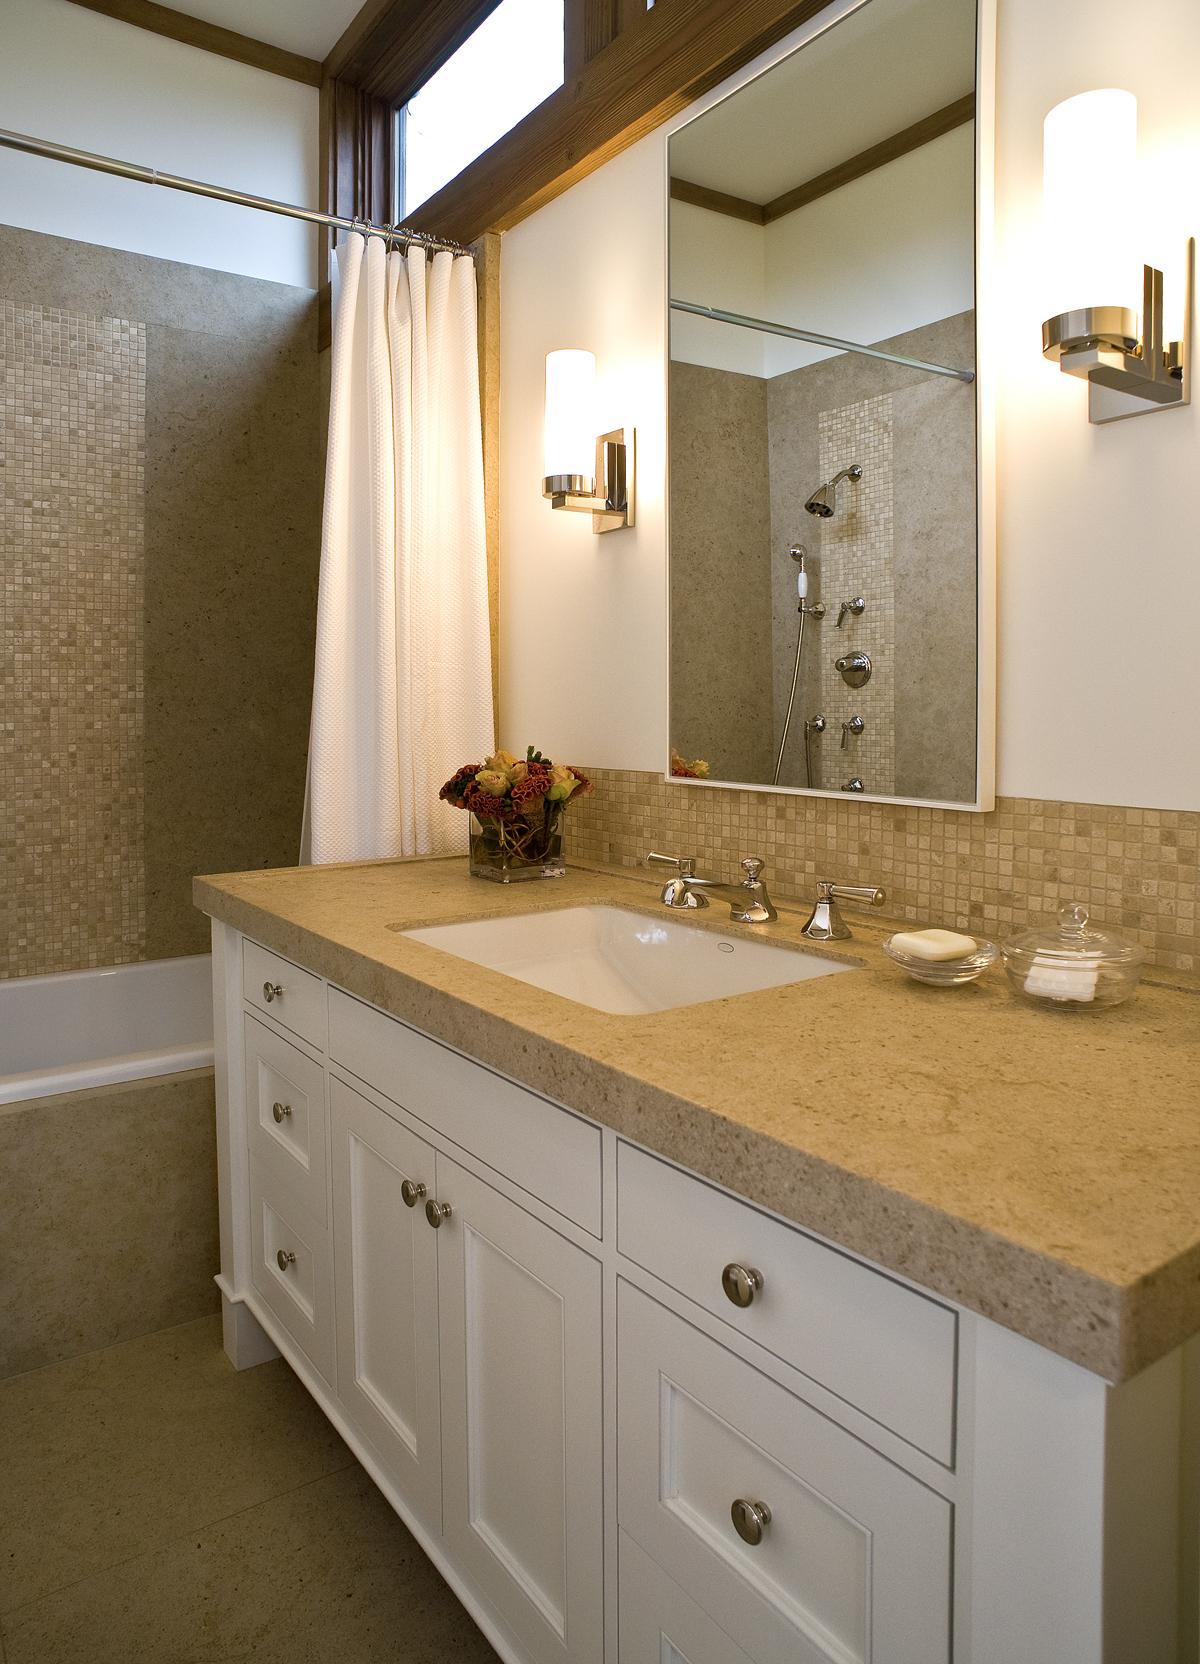 Bathroom Crop DSC_9998-2.jpg